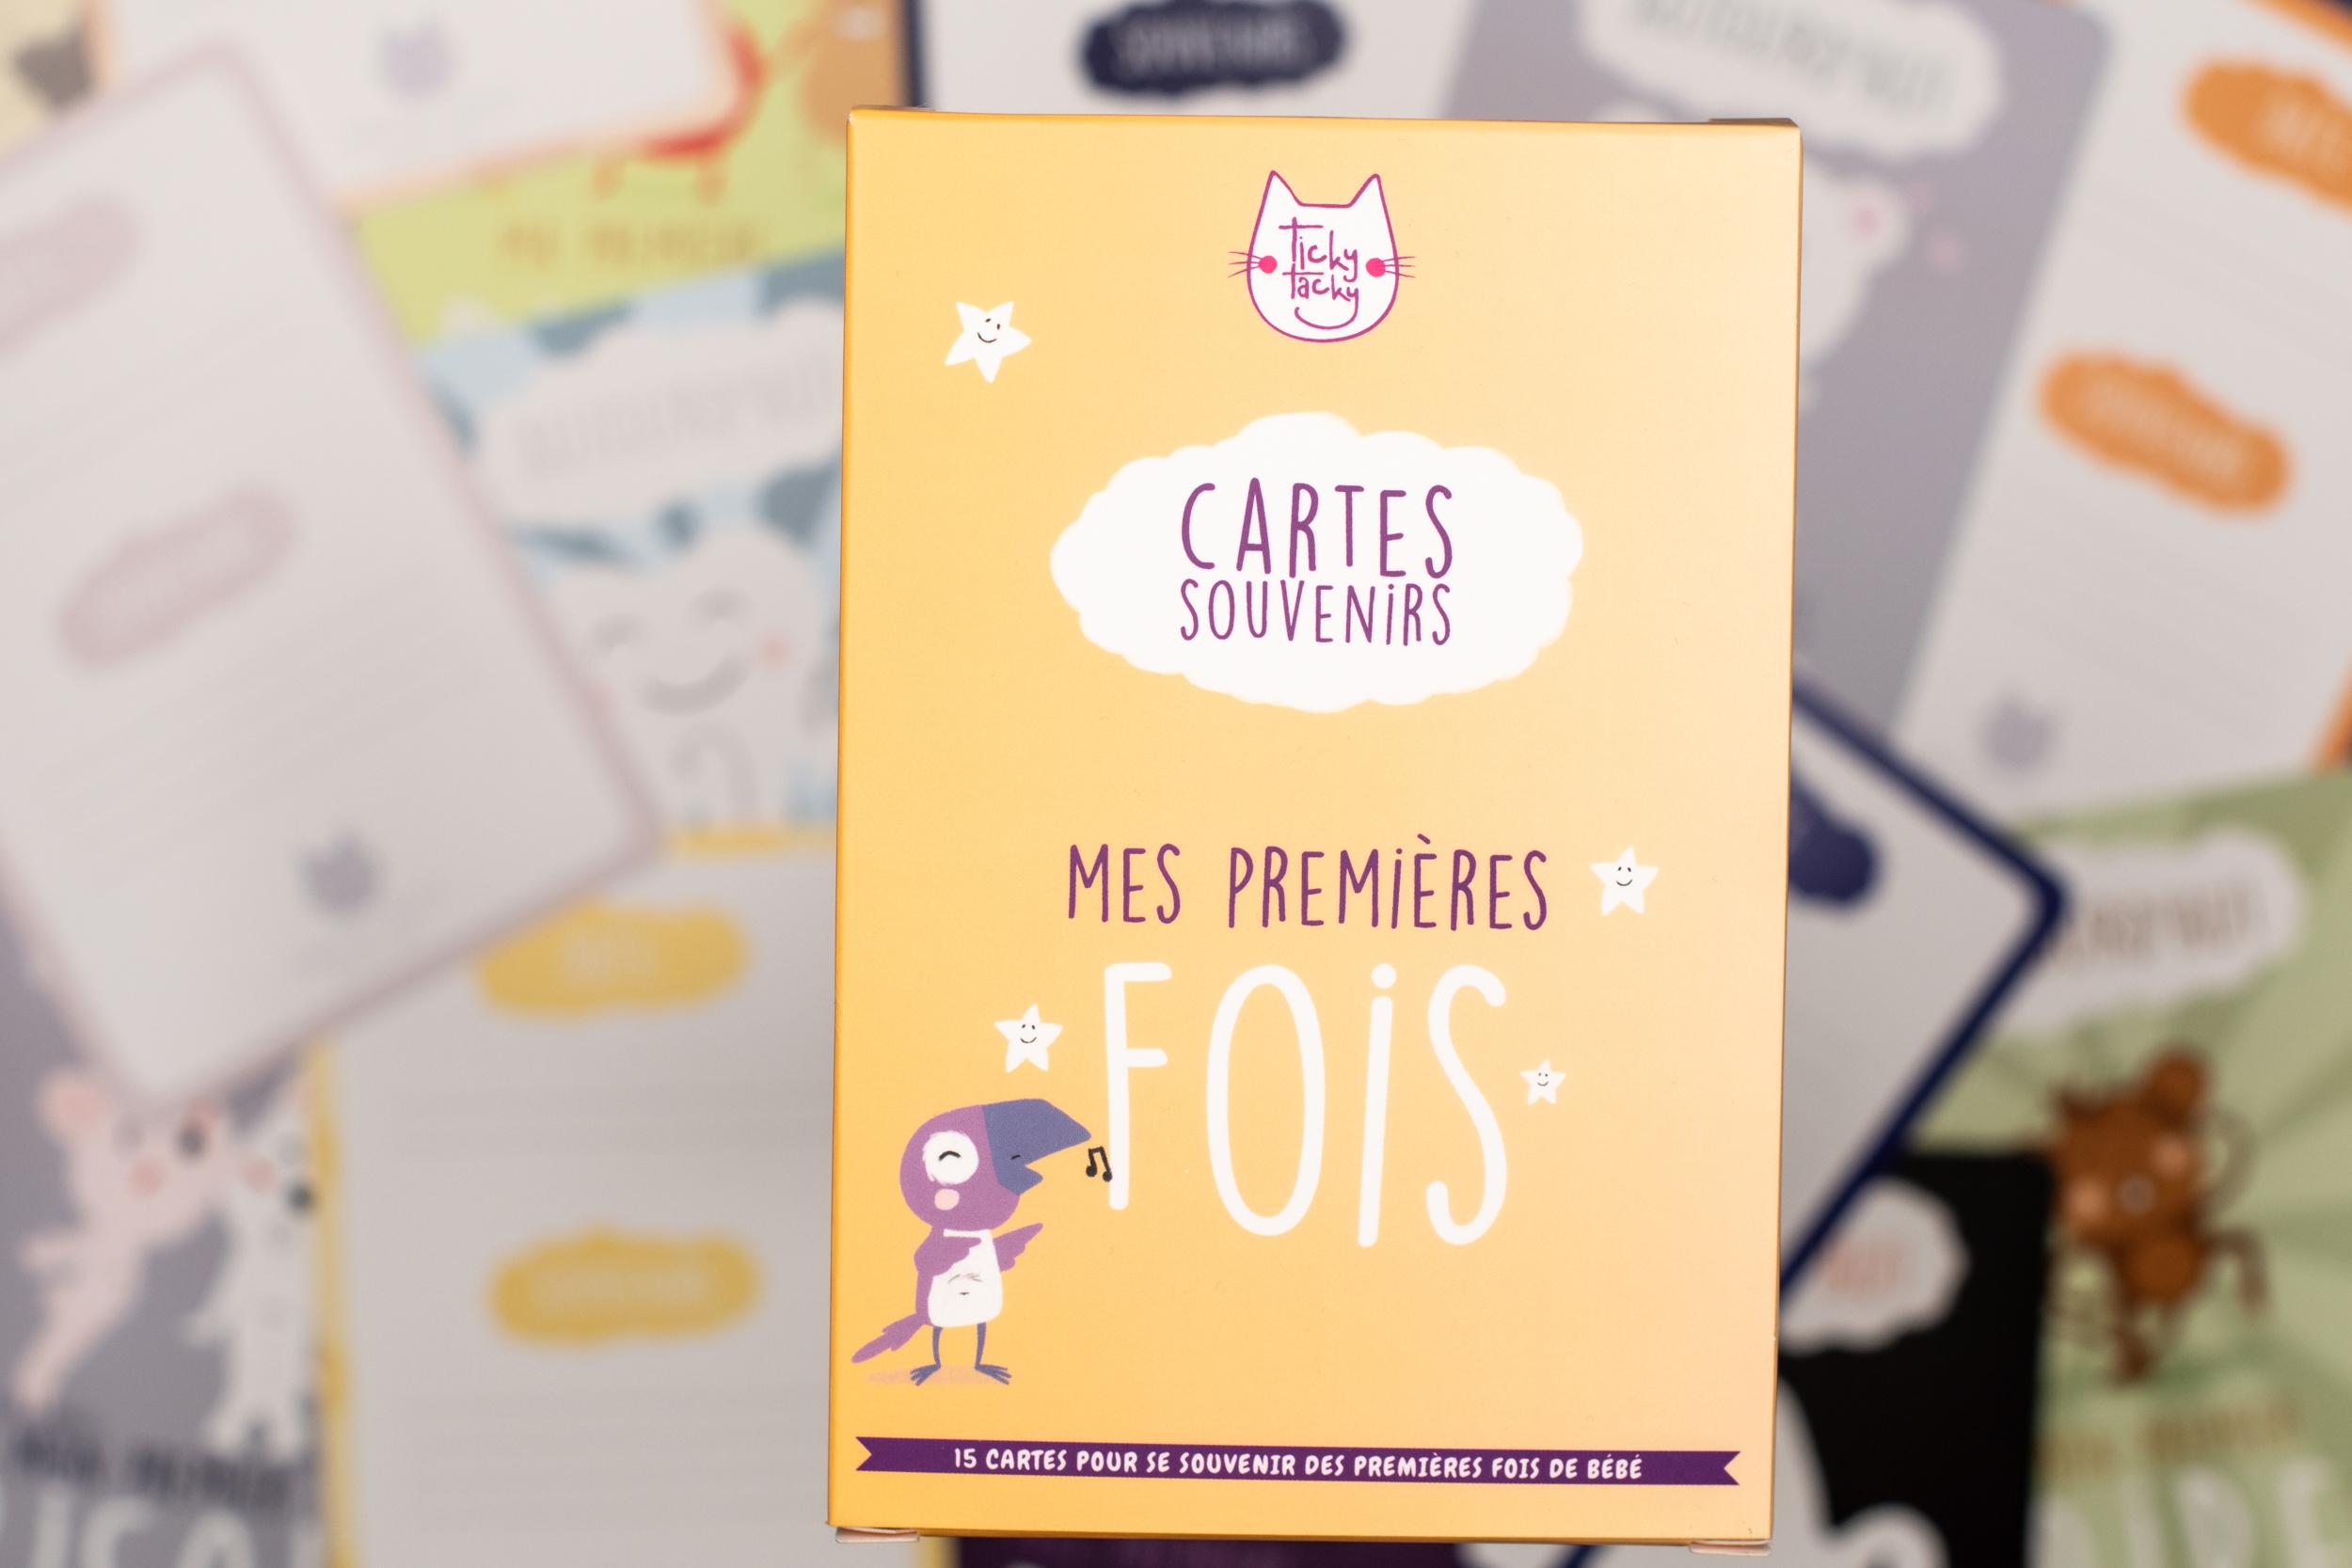 Ticky-Tacky-Carte-Souvenirs-Etape-Fois-14